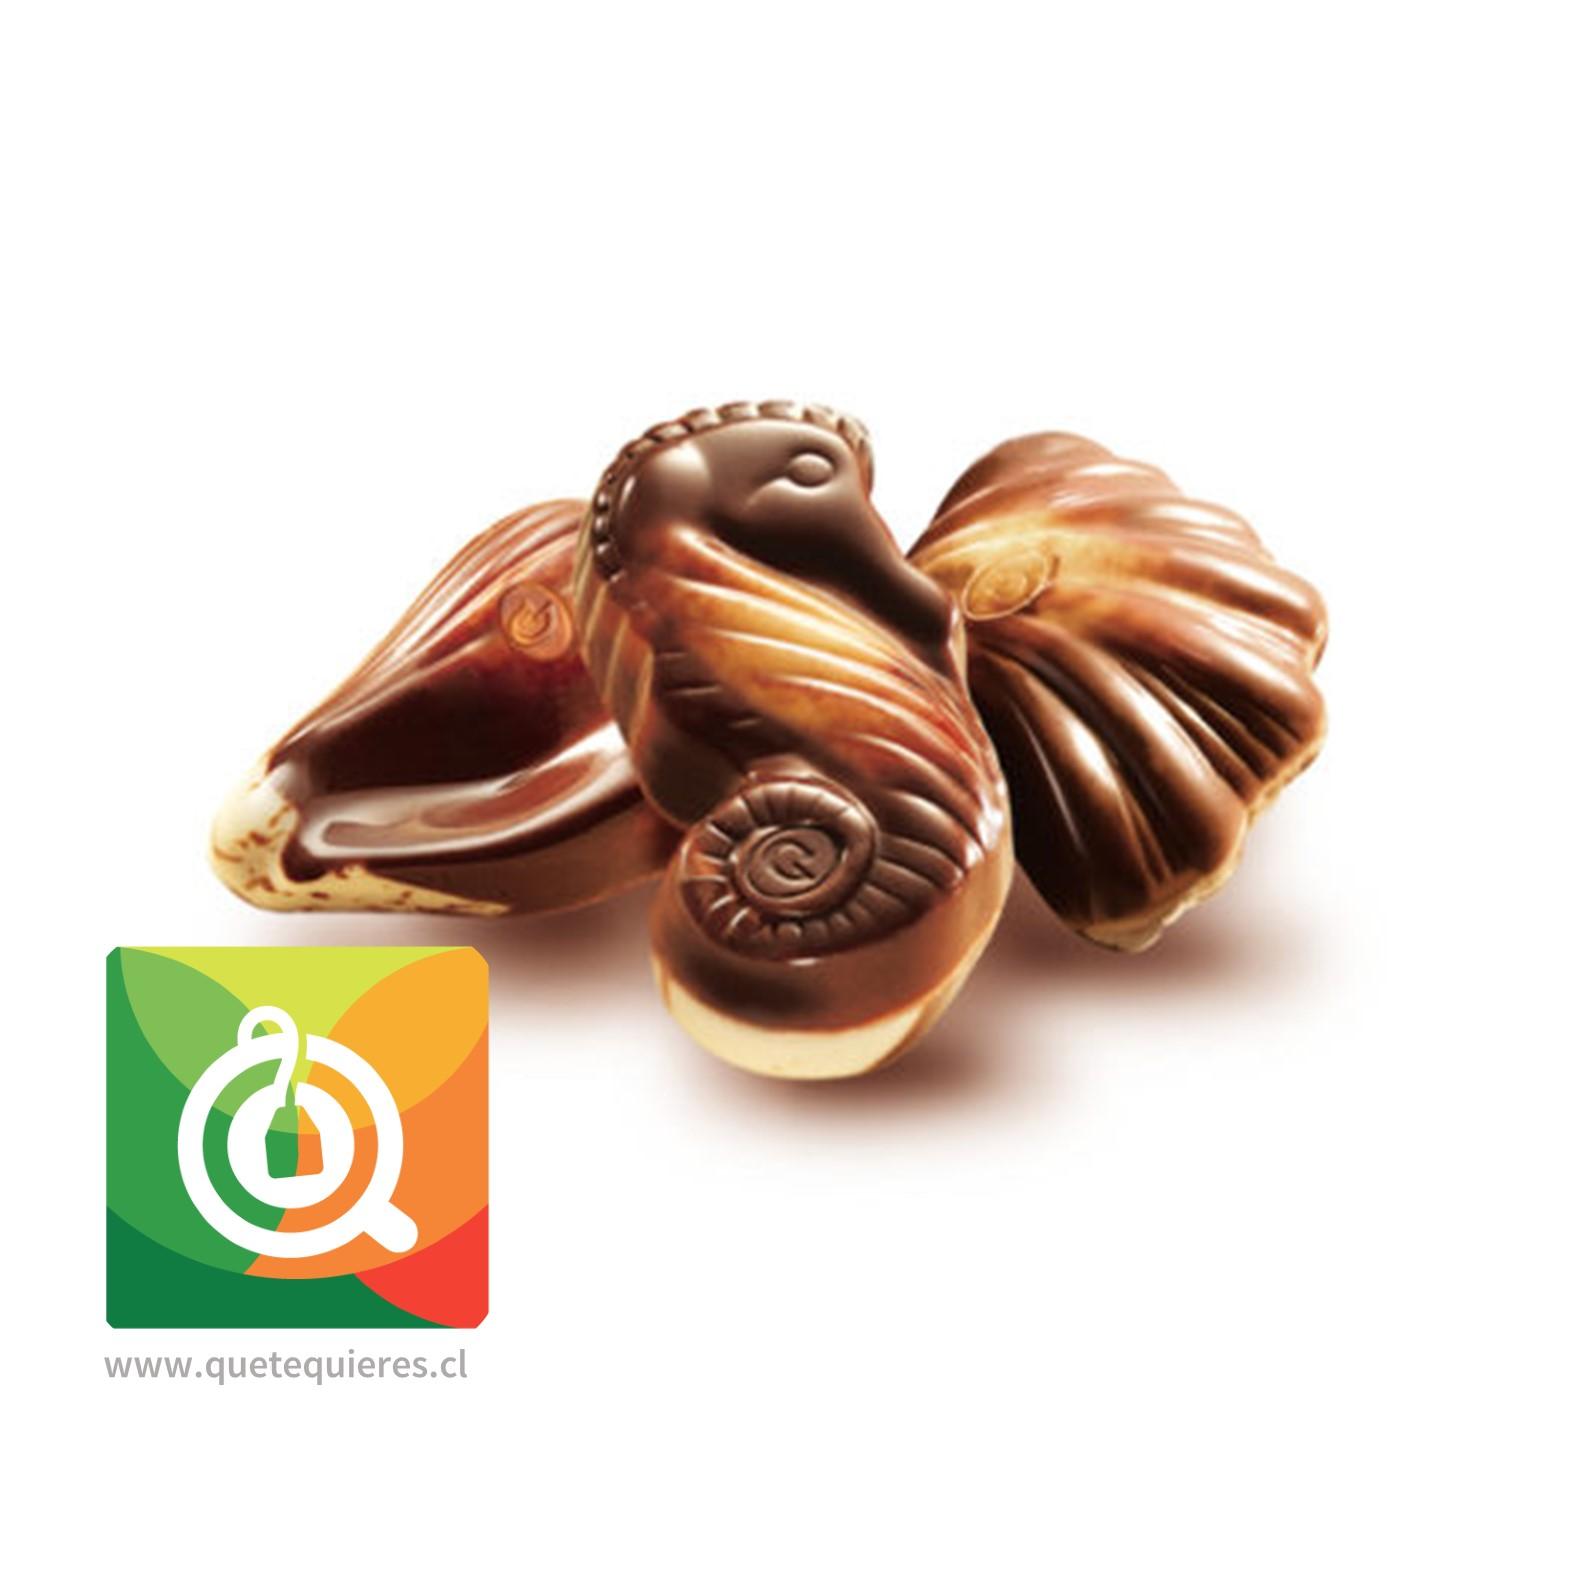 Guylian Bombon Chocolate Sea Shell 125 gr - Image 2